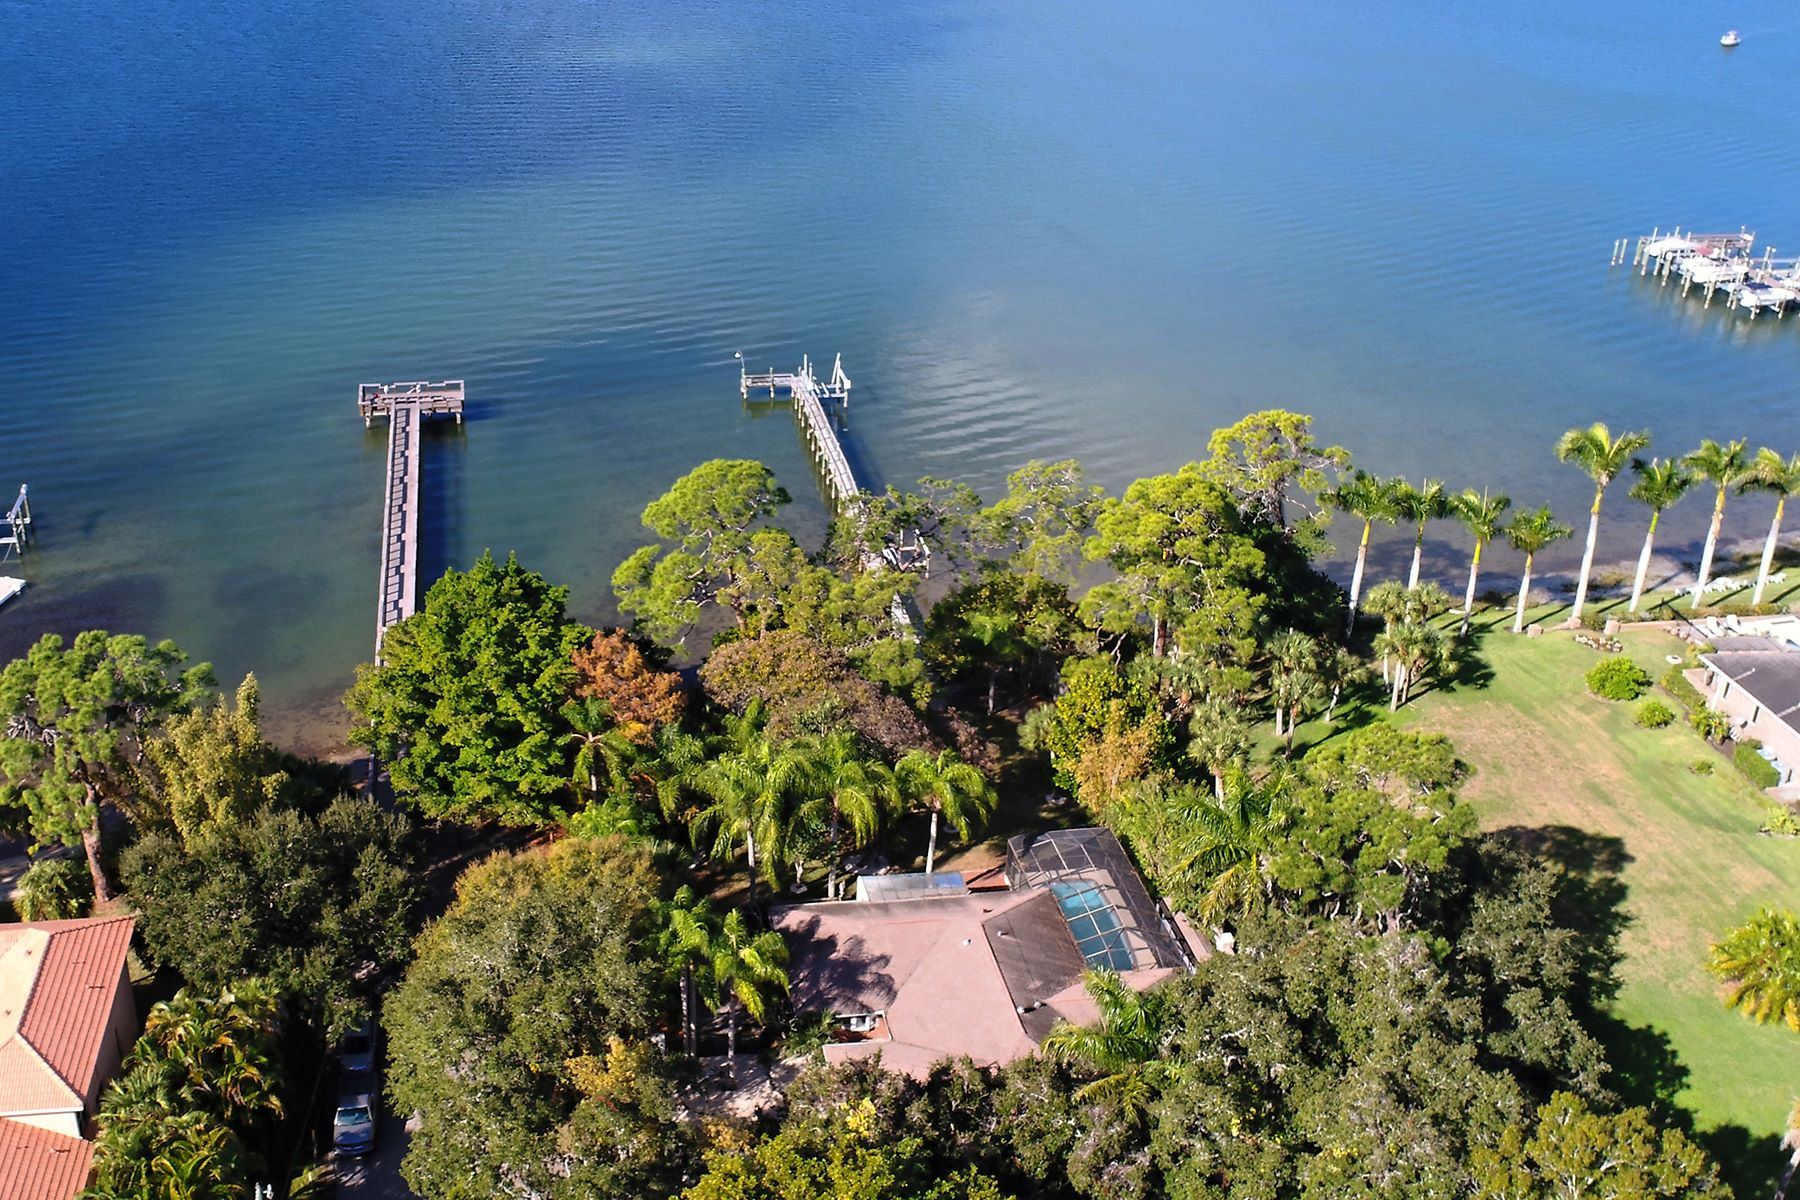 Đất đai vì Bán tại VILLAGE OF OSPREY 128 Main St 5 Osprey, Florida, 34229 Hoa Kỳ